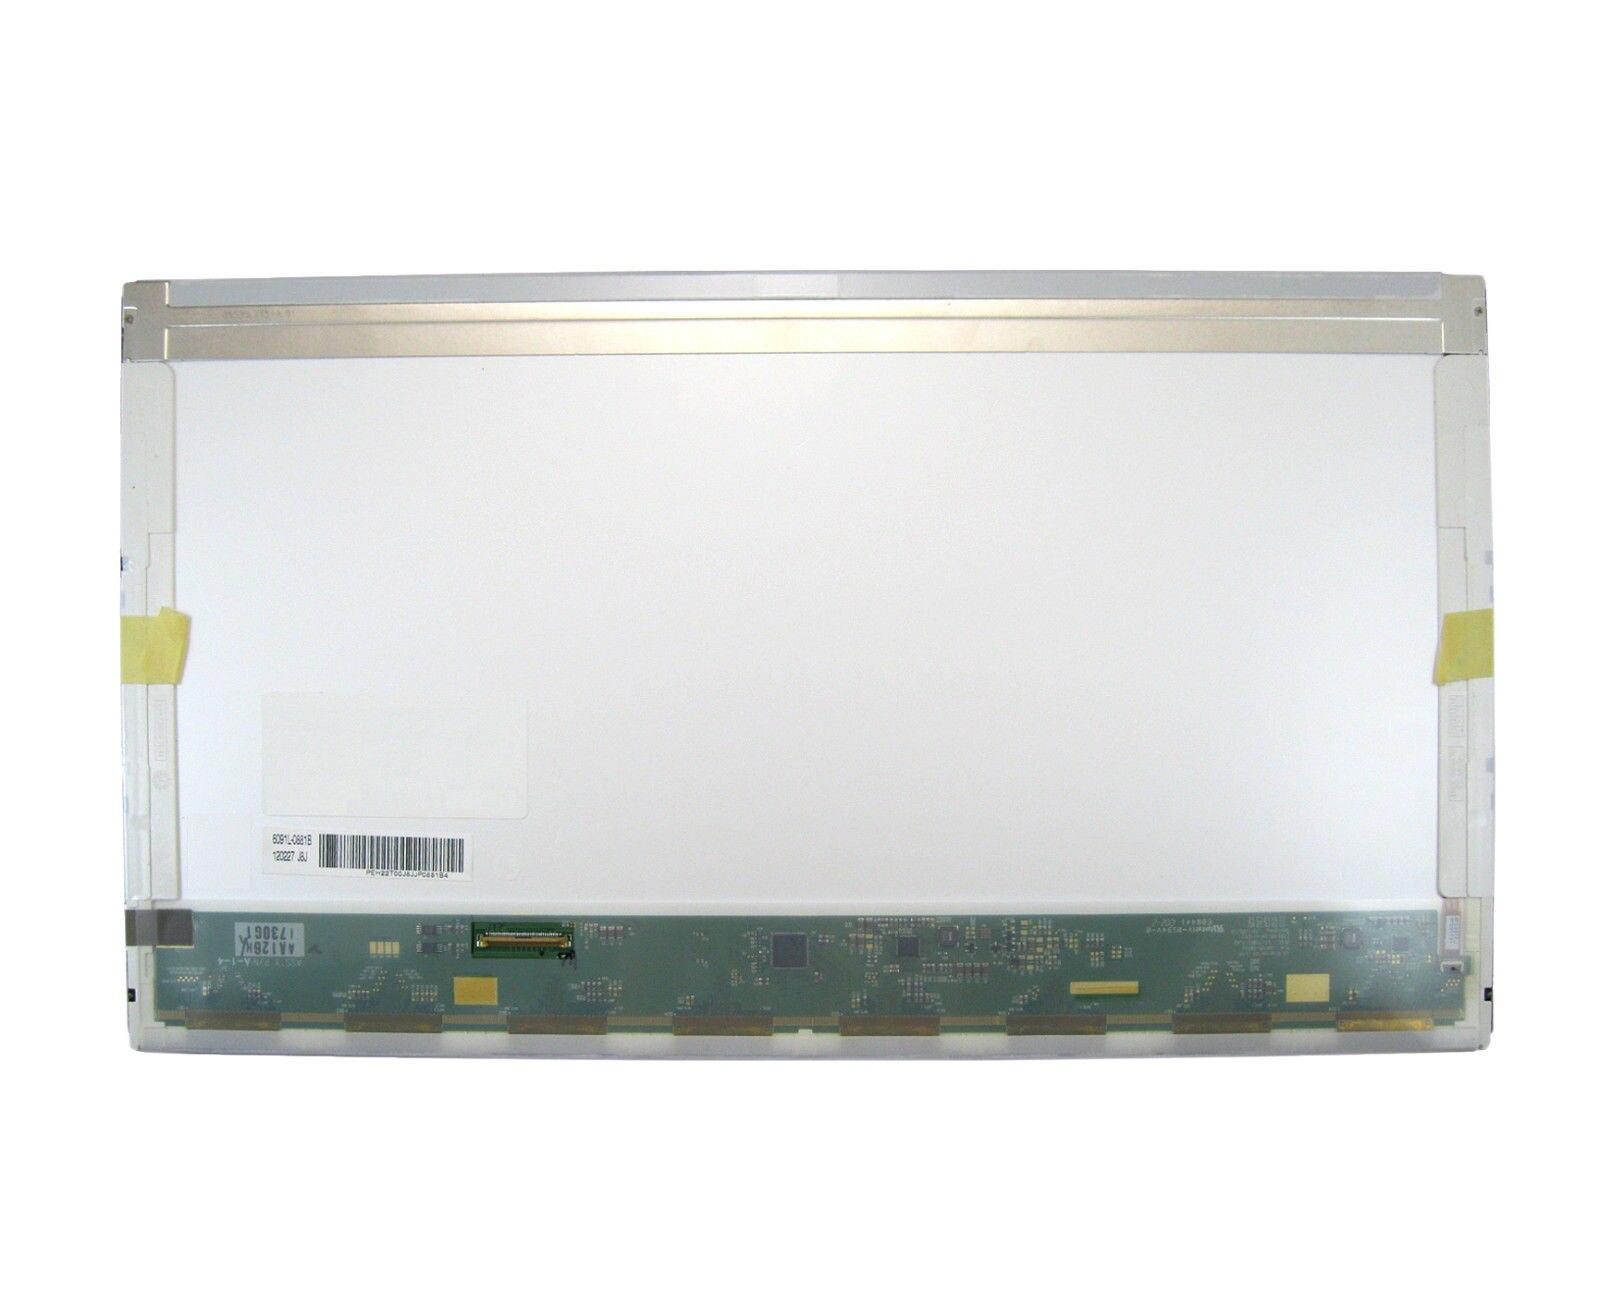 N173FGE L21 NEW 17.3 LED WXGA++ HD LCD Screen/Display for Laptop, Rev C1